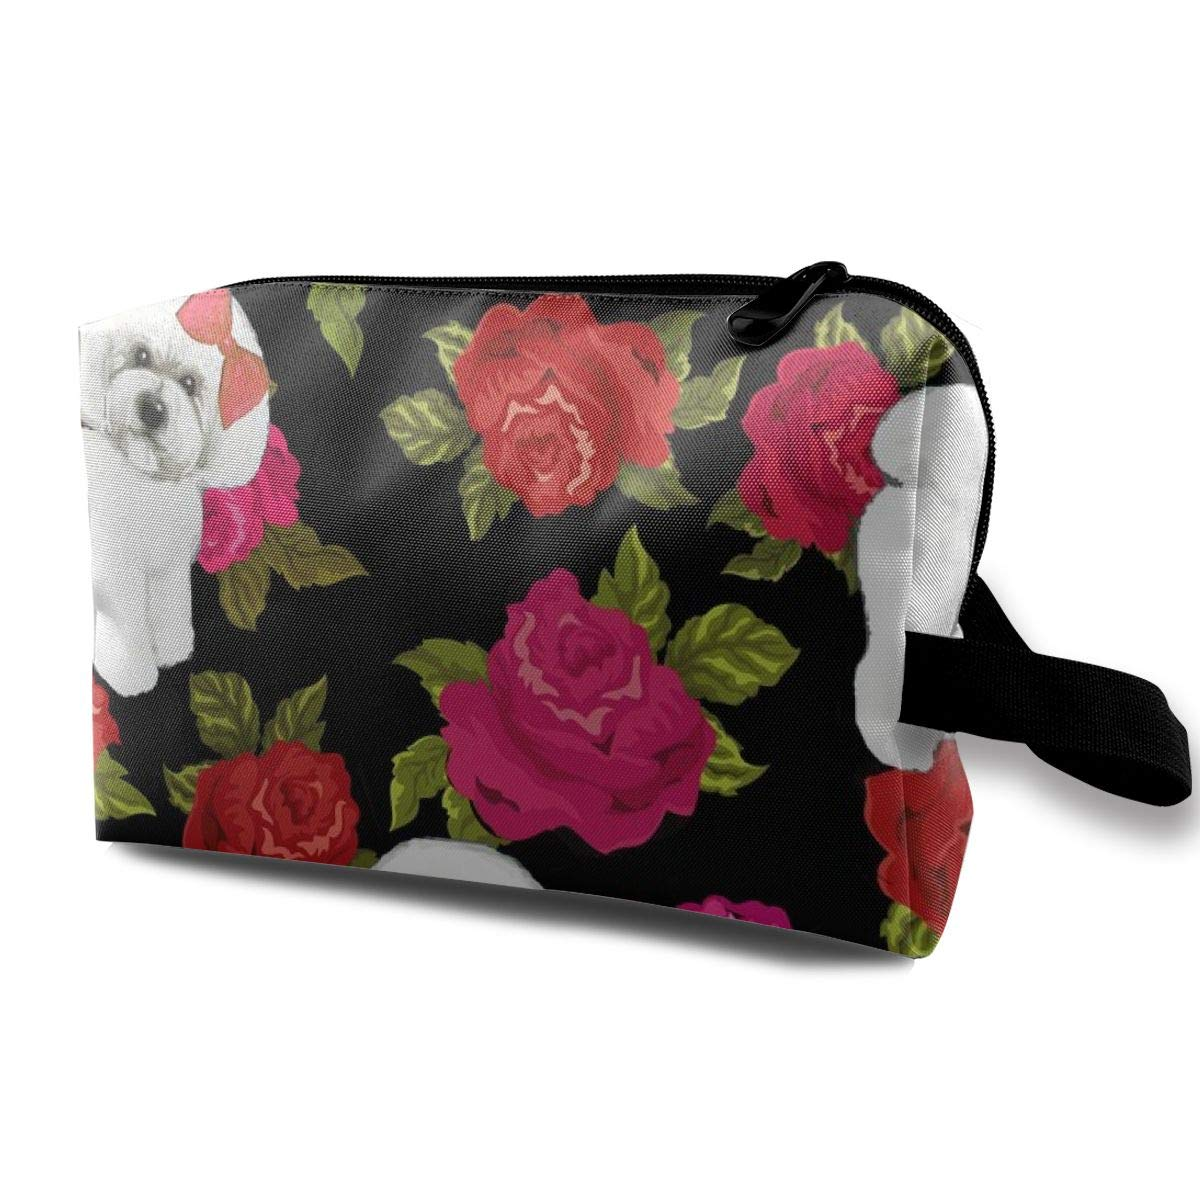 Bichon Frise On Floral_5433 - Neceser portátil para ...